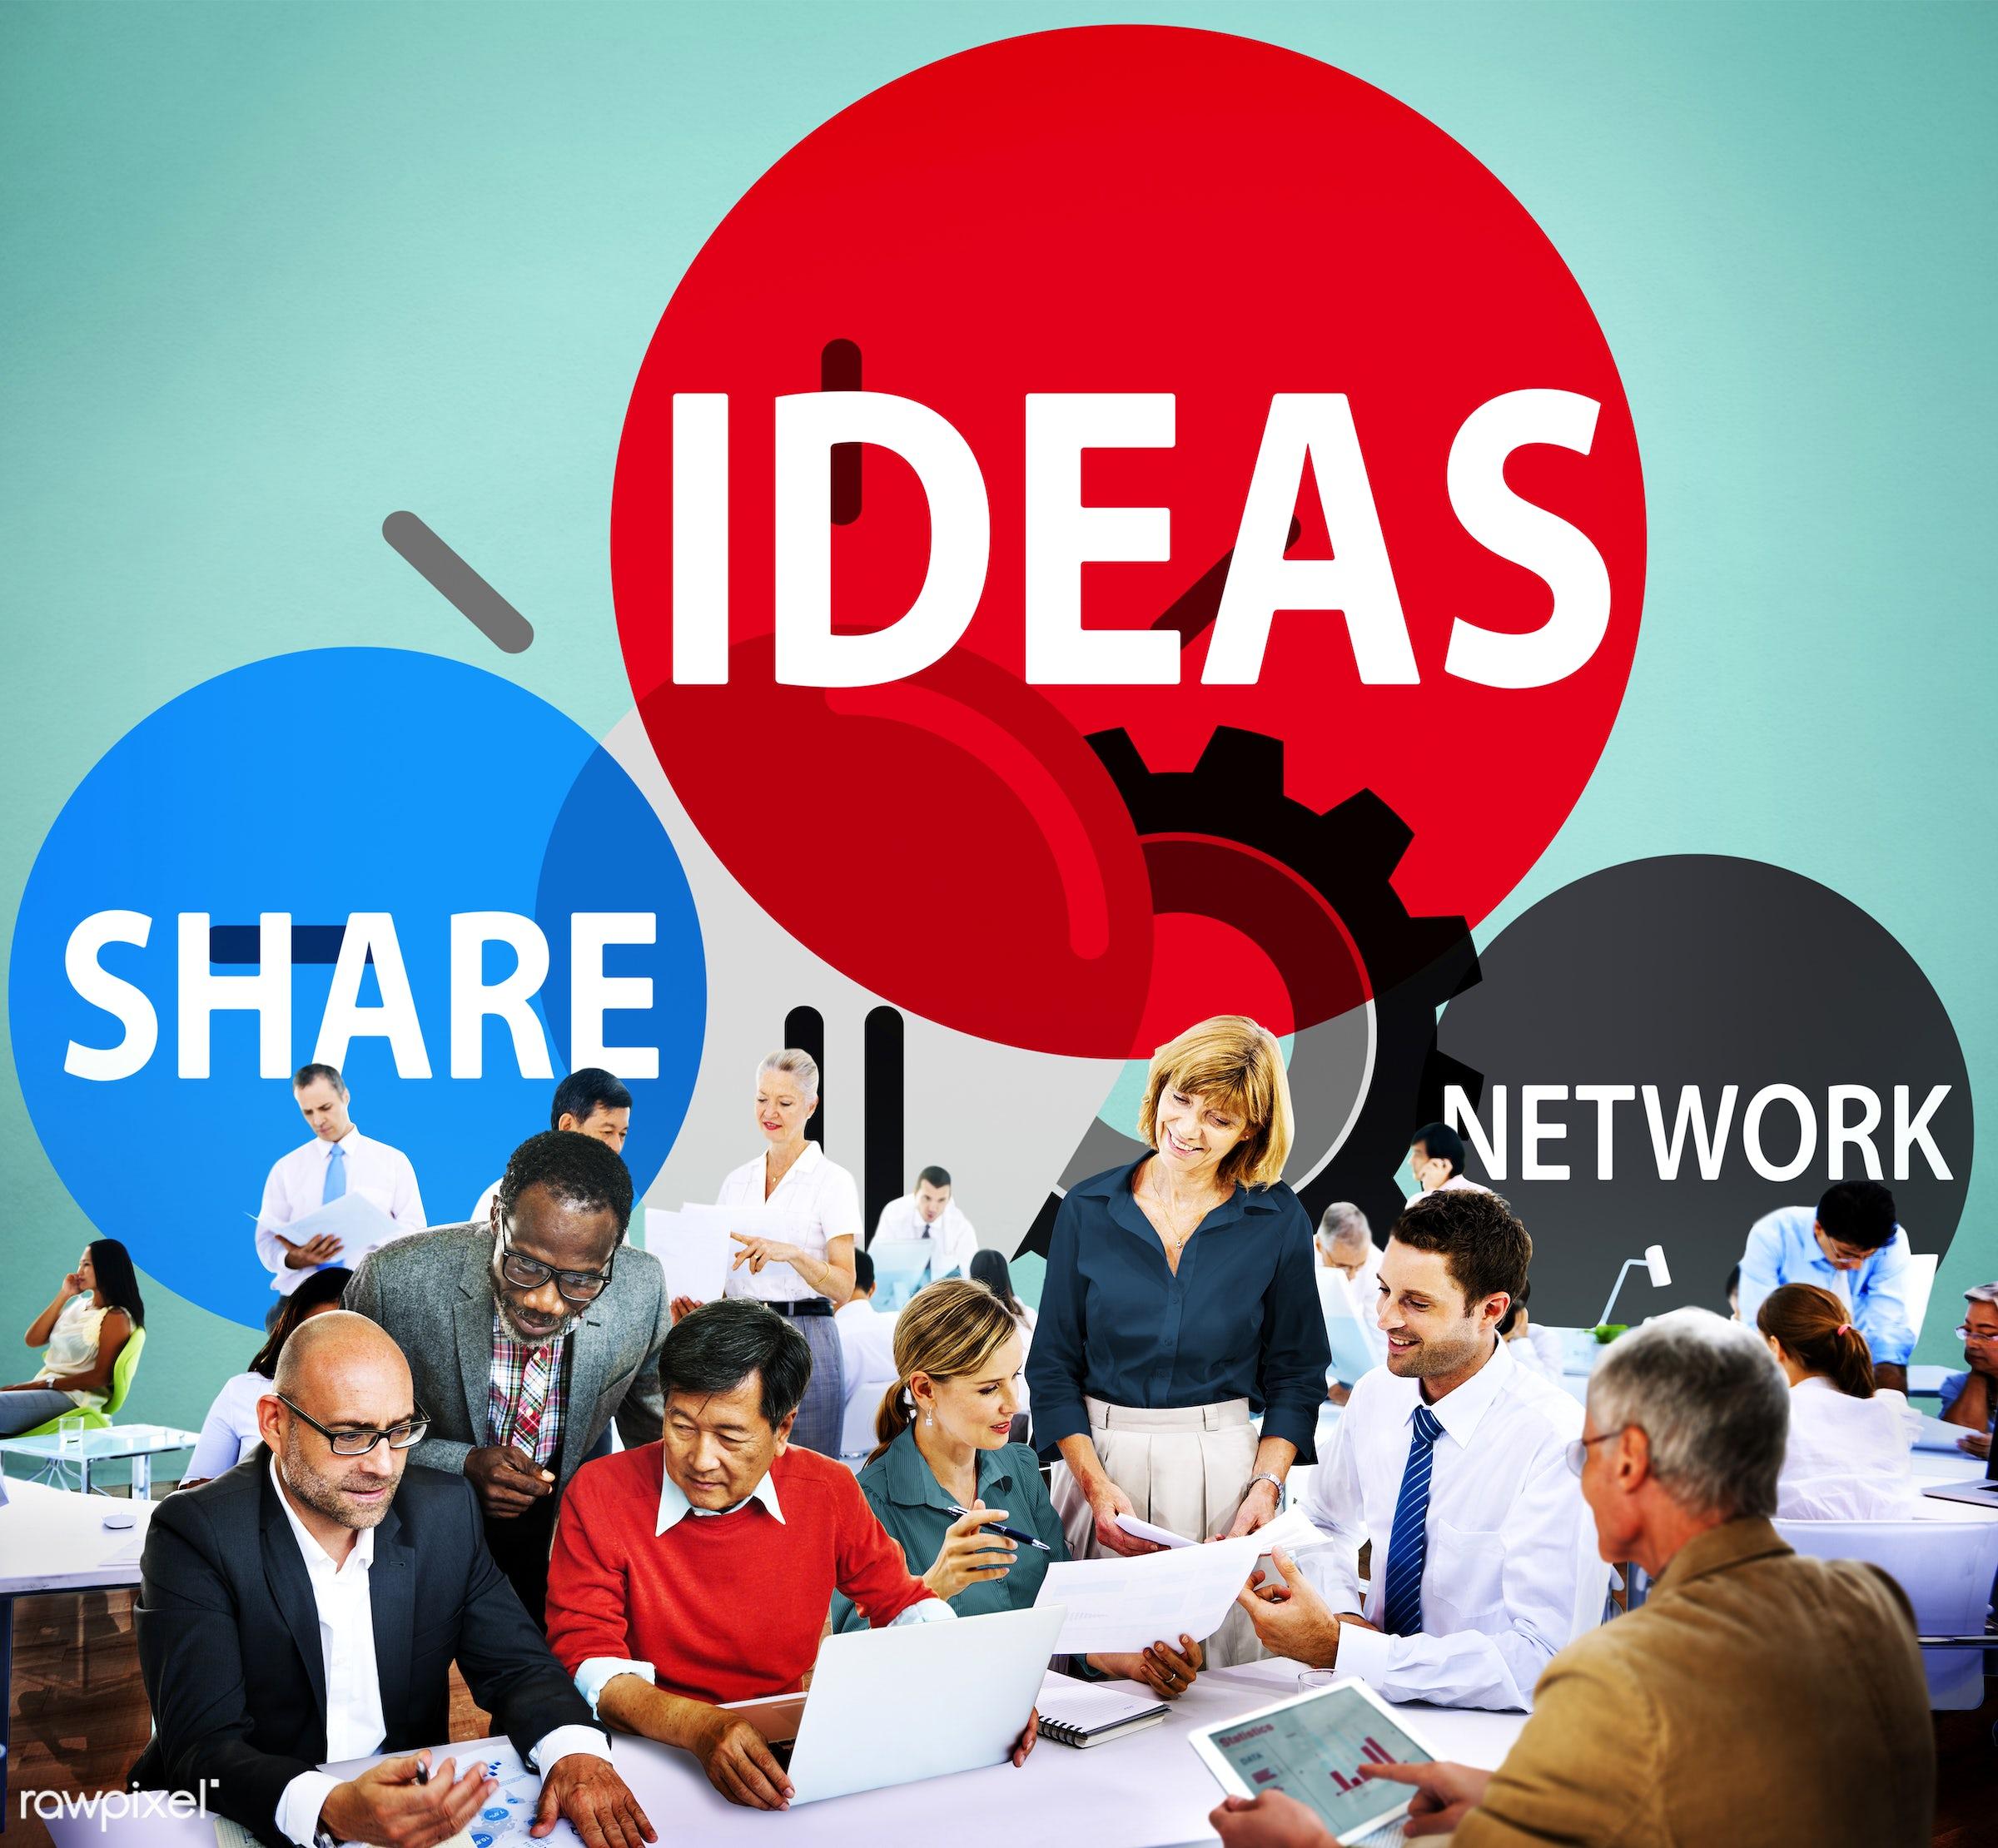 analysis, business, business people, businessmen, businesswomen, busy, communication, conversation, corporate, creative,...